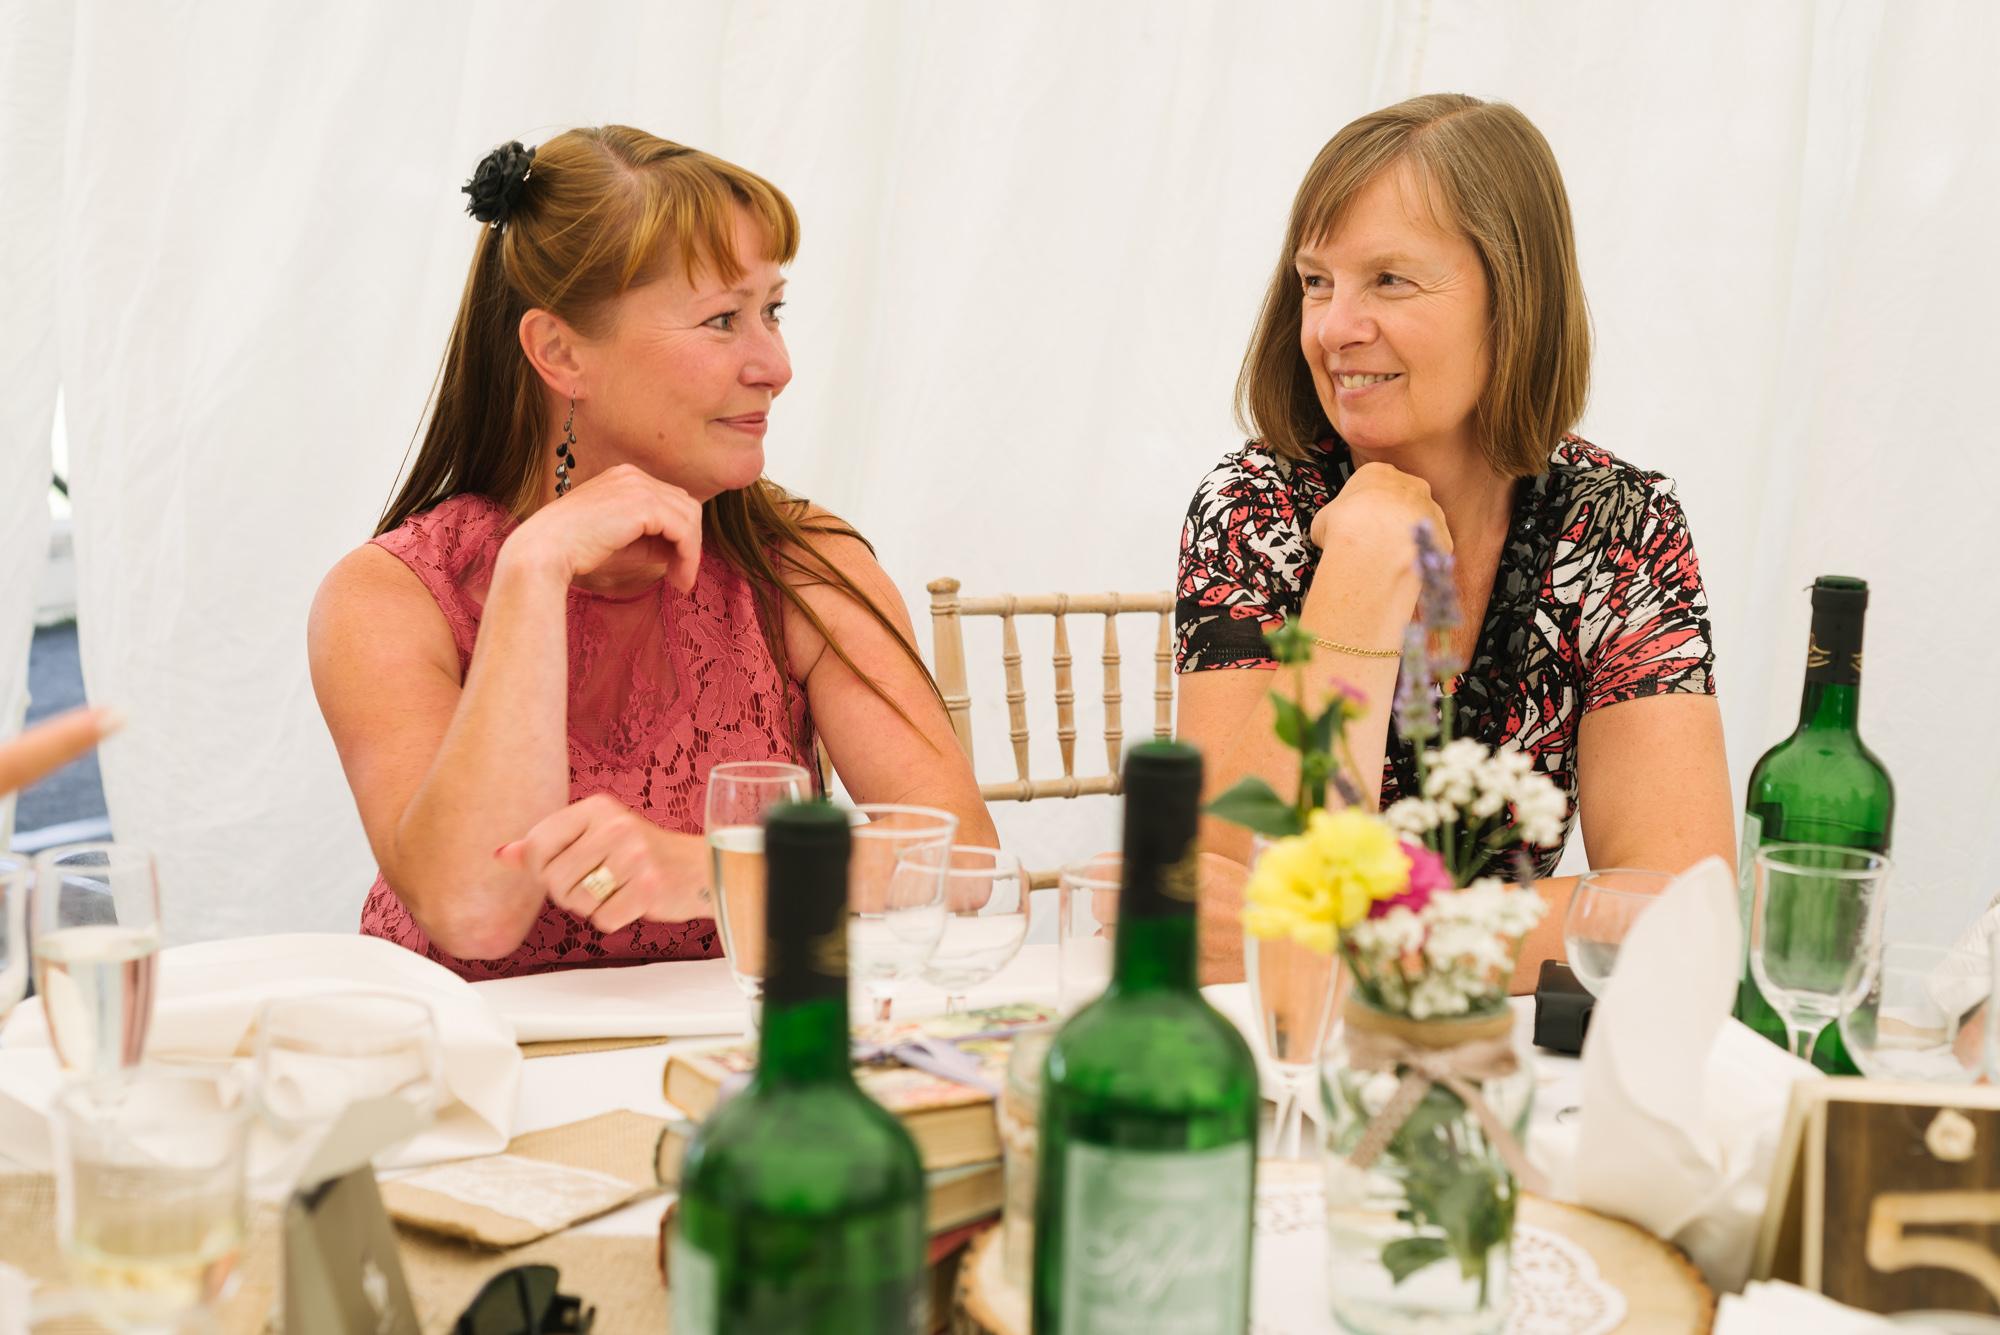 Cricket Club Wedding Tea Party Eversholt Bedfordshire-51